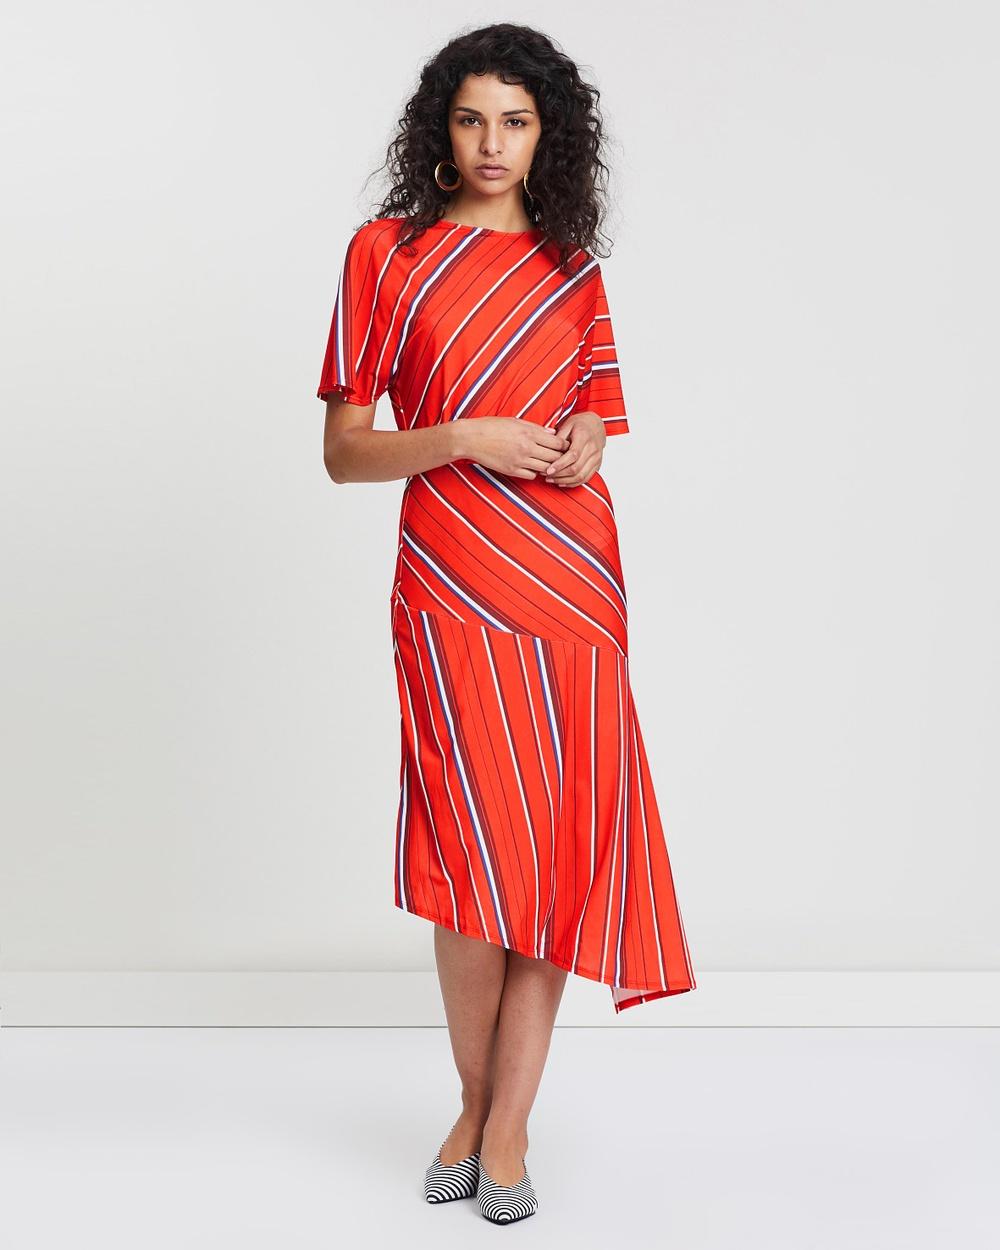 Warehouse Red Diagonal Stripe Printed Dress